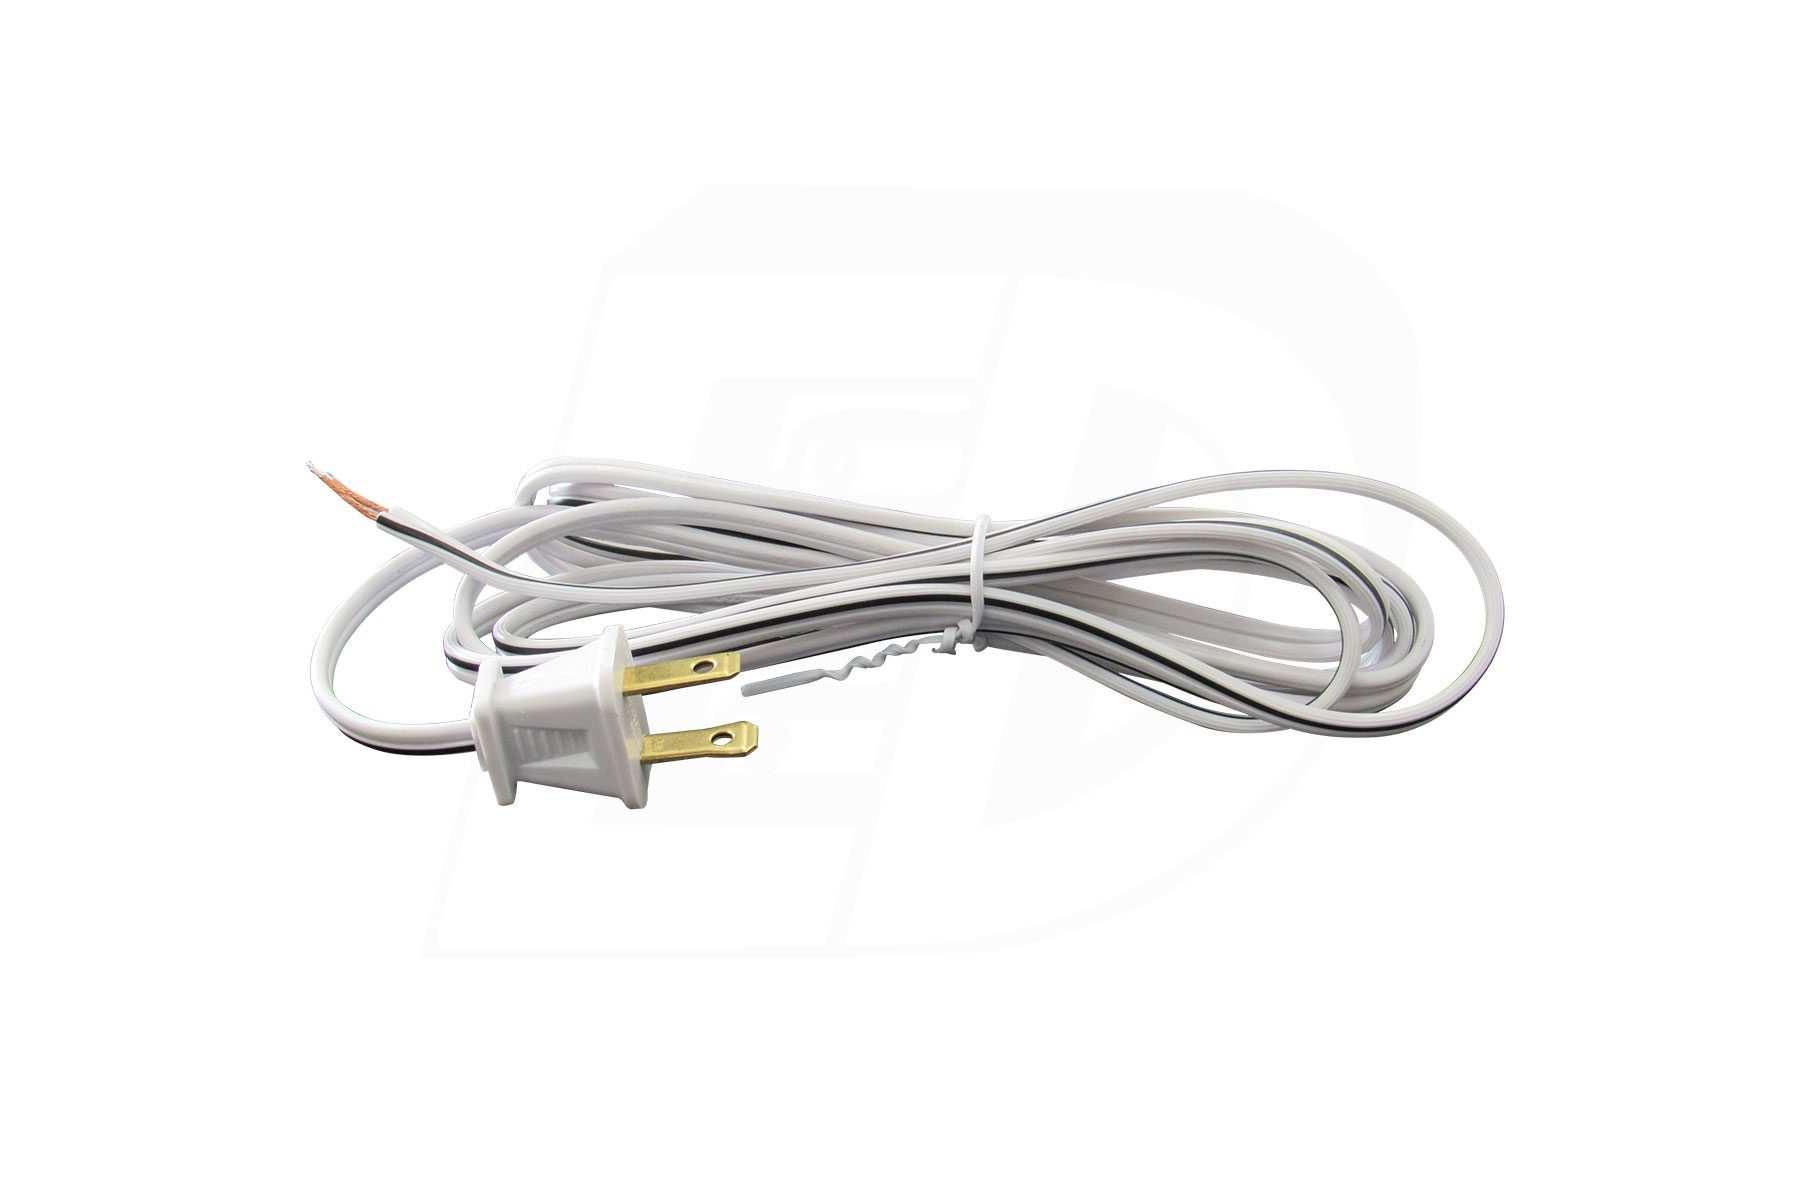 SPT-1 AC Power Cord